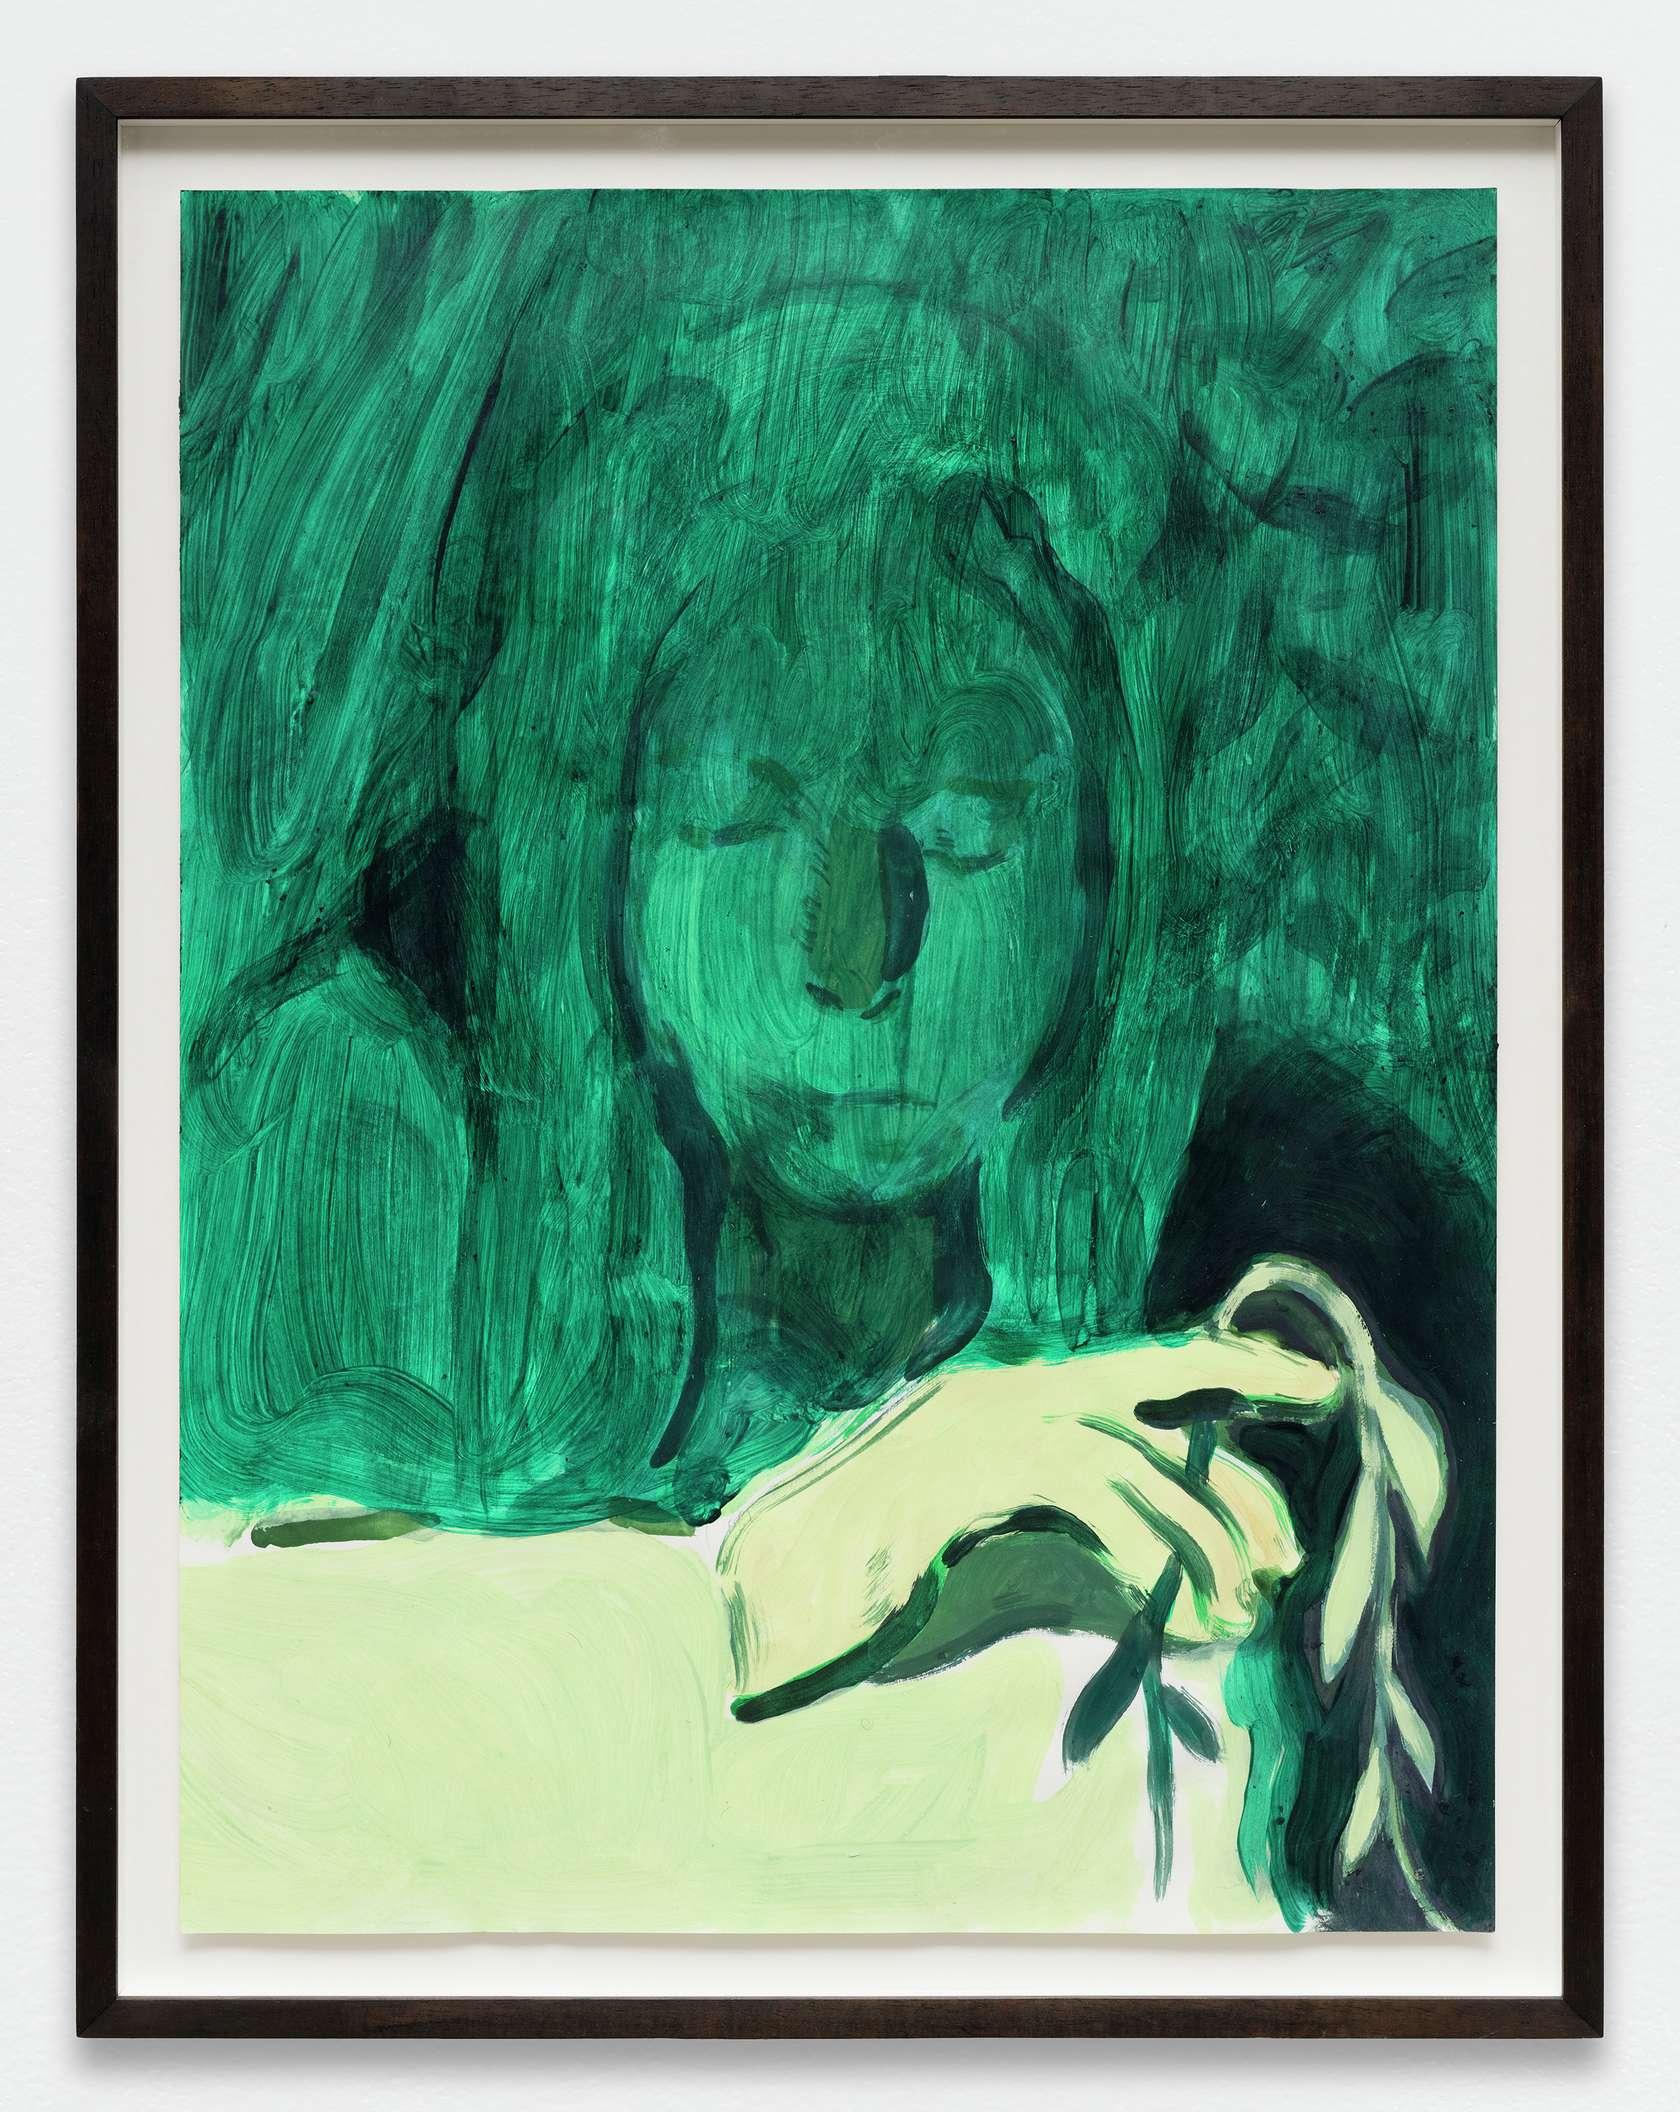 Anthony Cudahy, Shaded, 2019 Acrylique sur papier61 × 46 cm / 24  × 18 1/8 in. | 68 × 53 cm / 26 6/8 × 20 7/8 in. (encadré/framed)